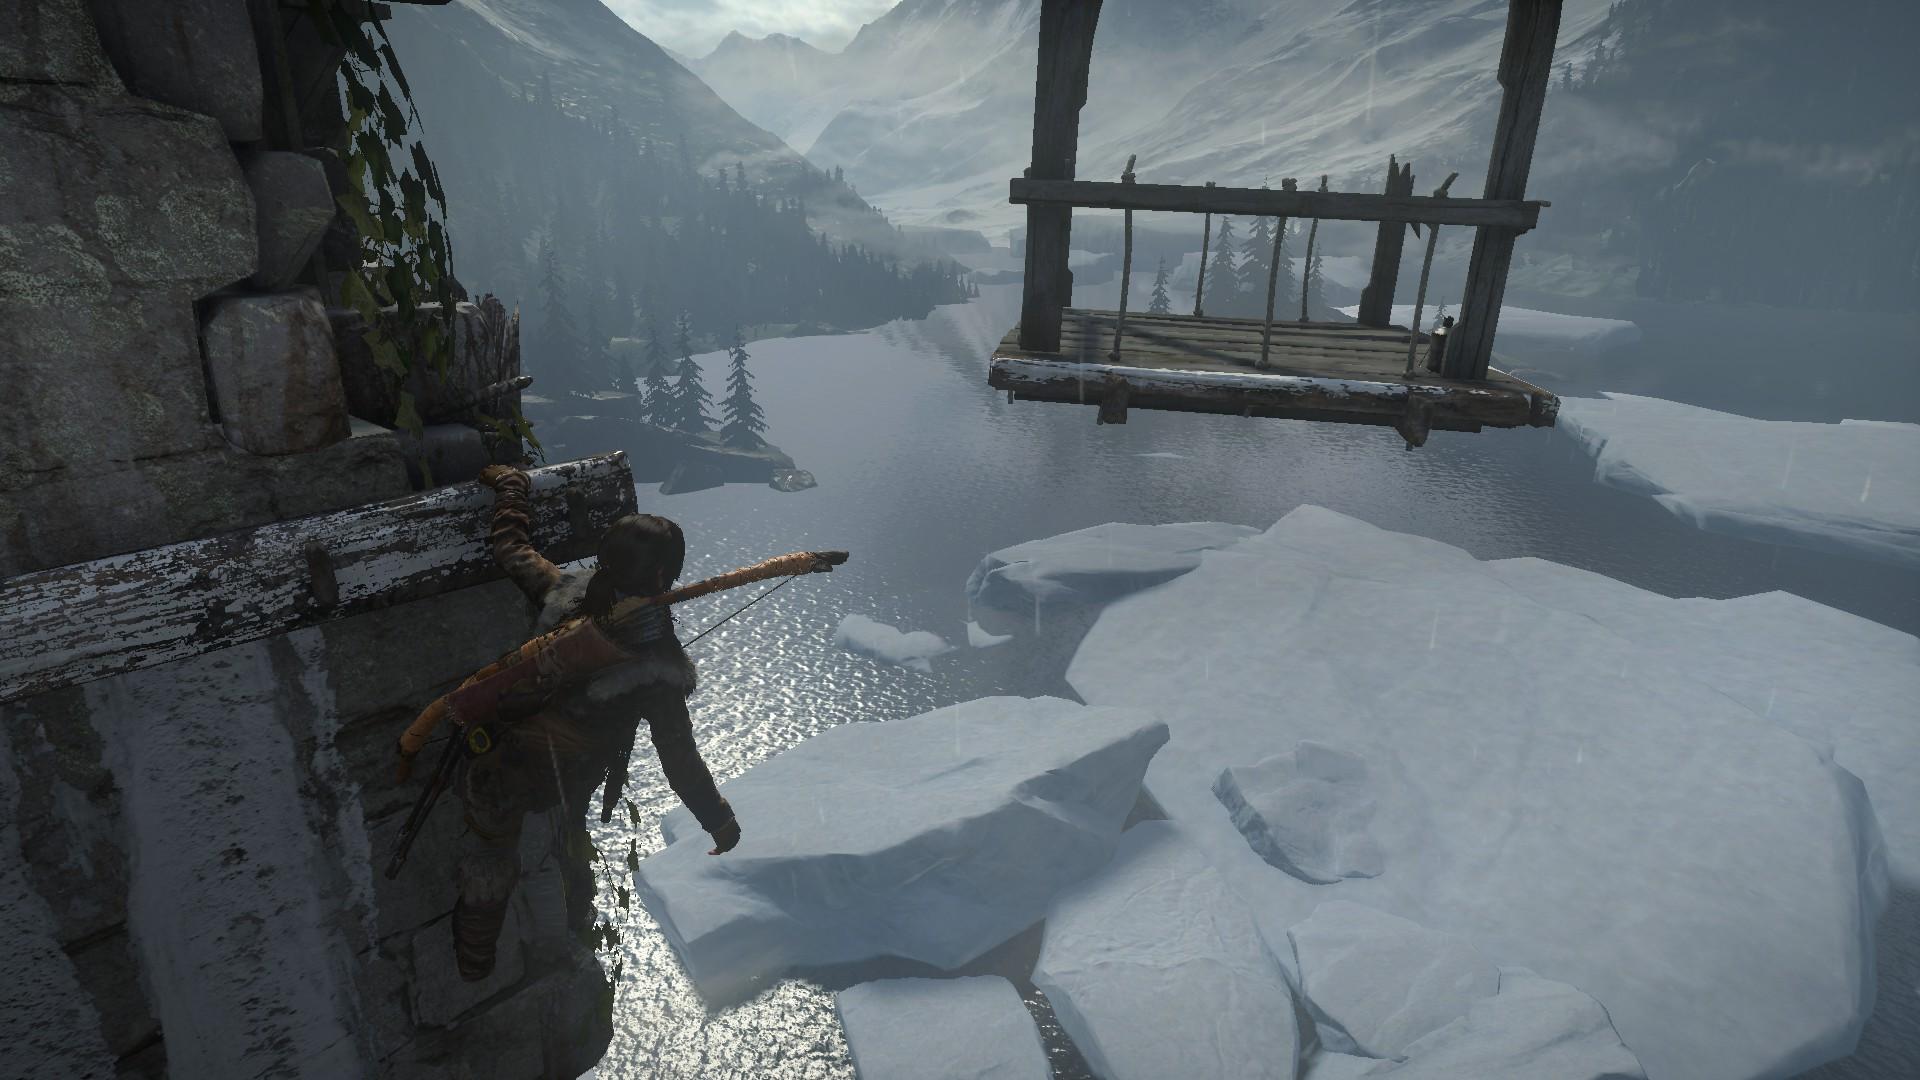 20171223121105_1.jpg - Rise of the Tomb Raider